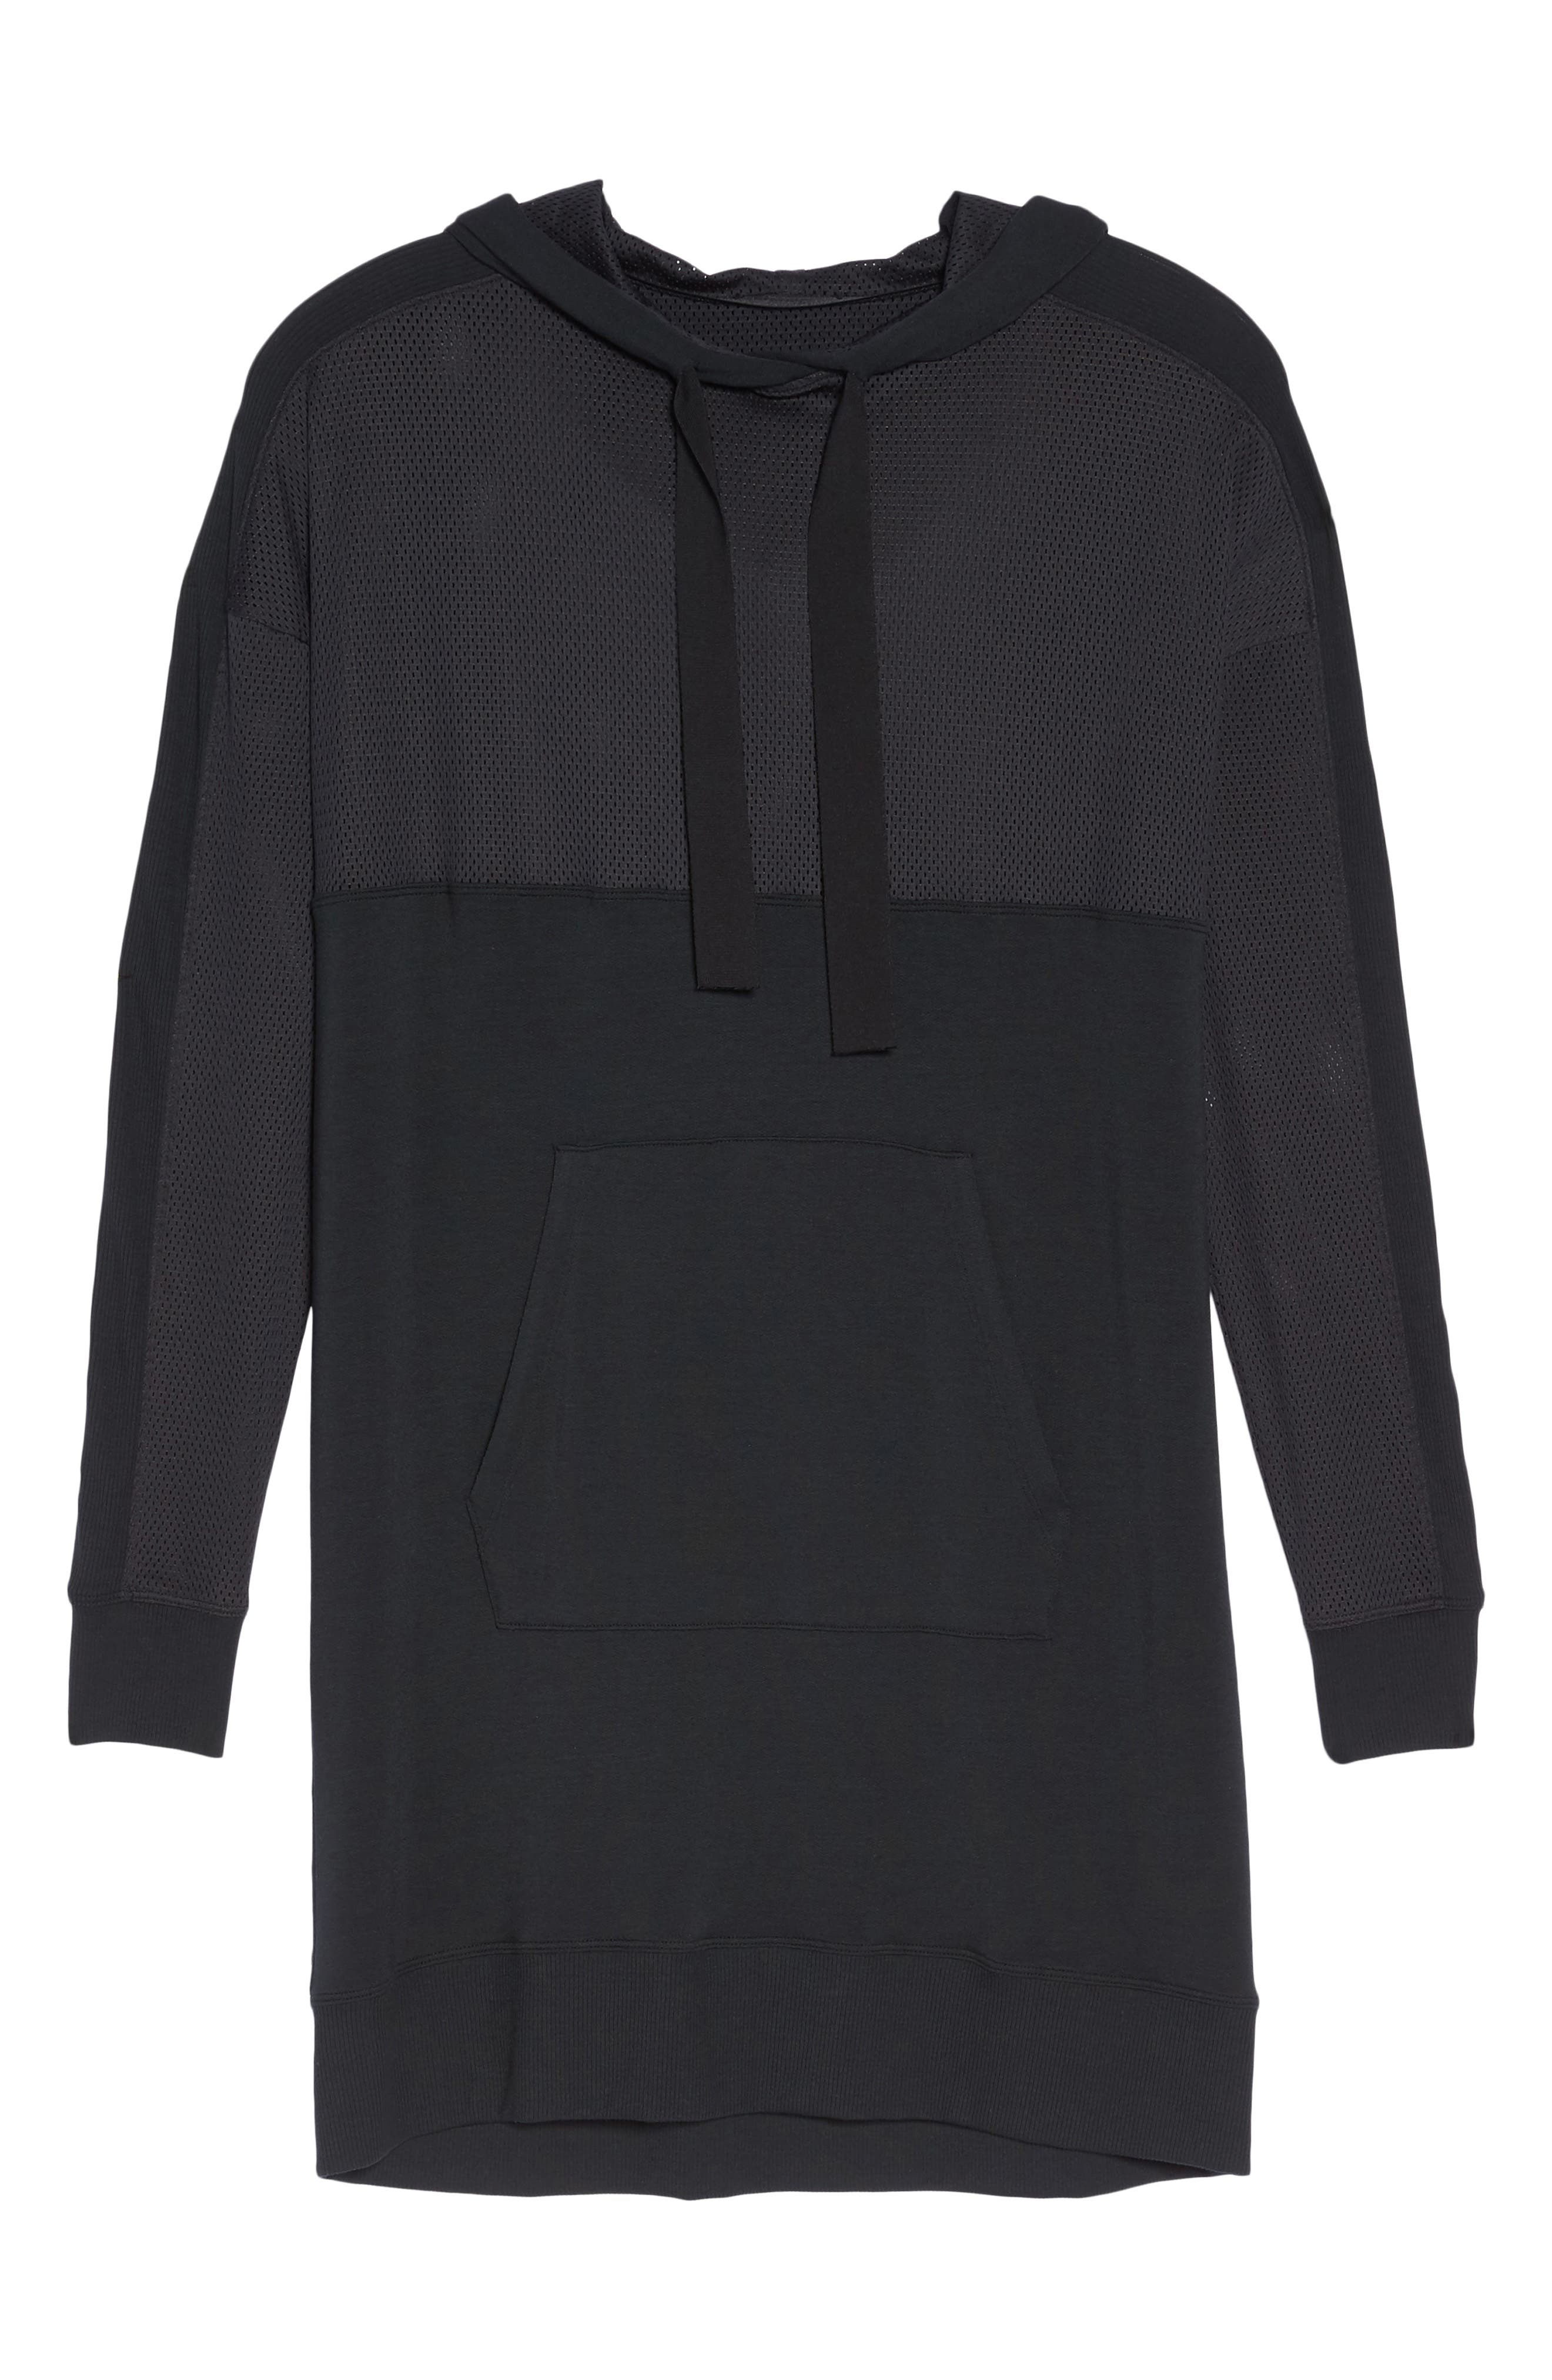 Range Dress,                             Alternate thumbnail 7, color,                             Black